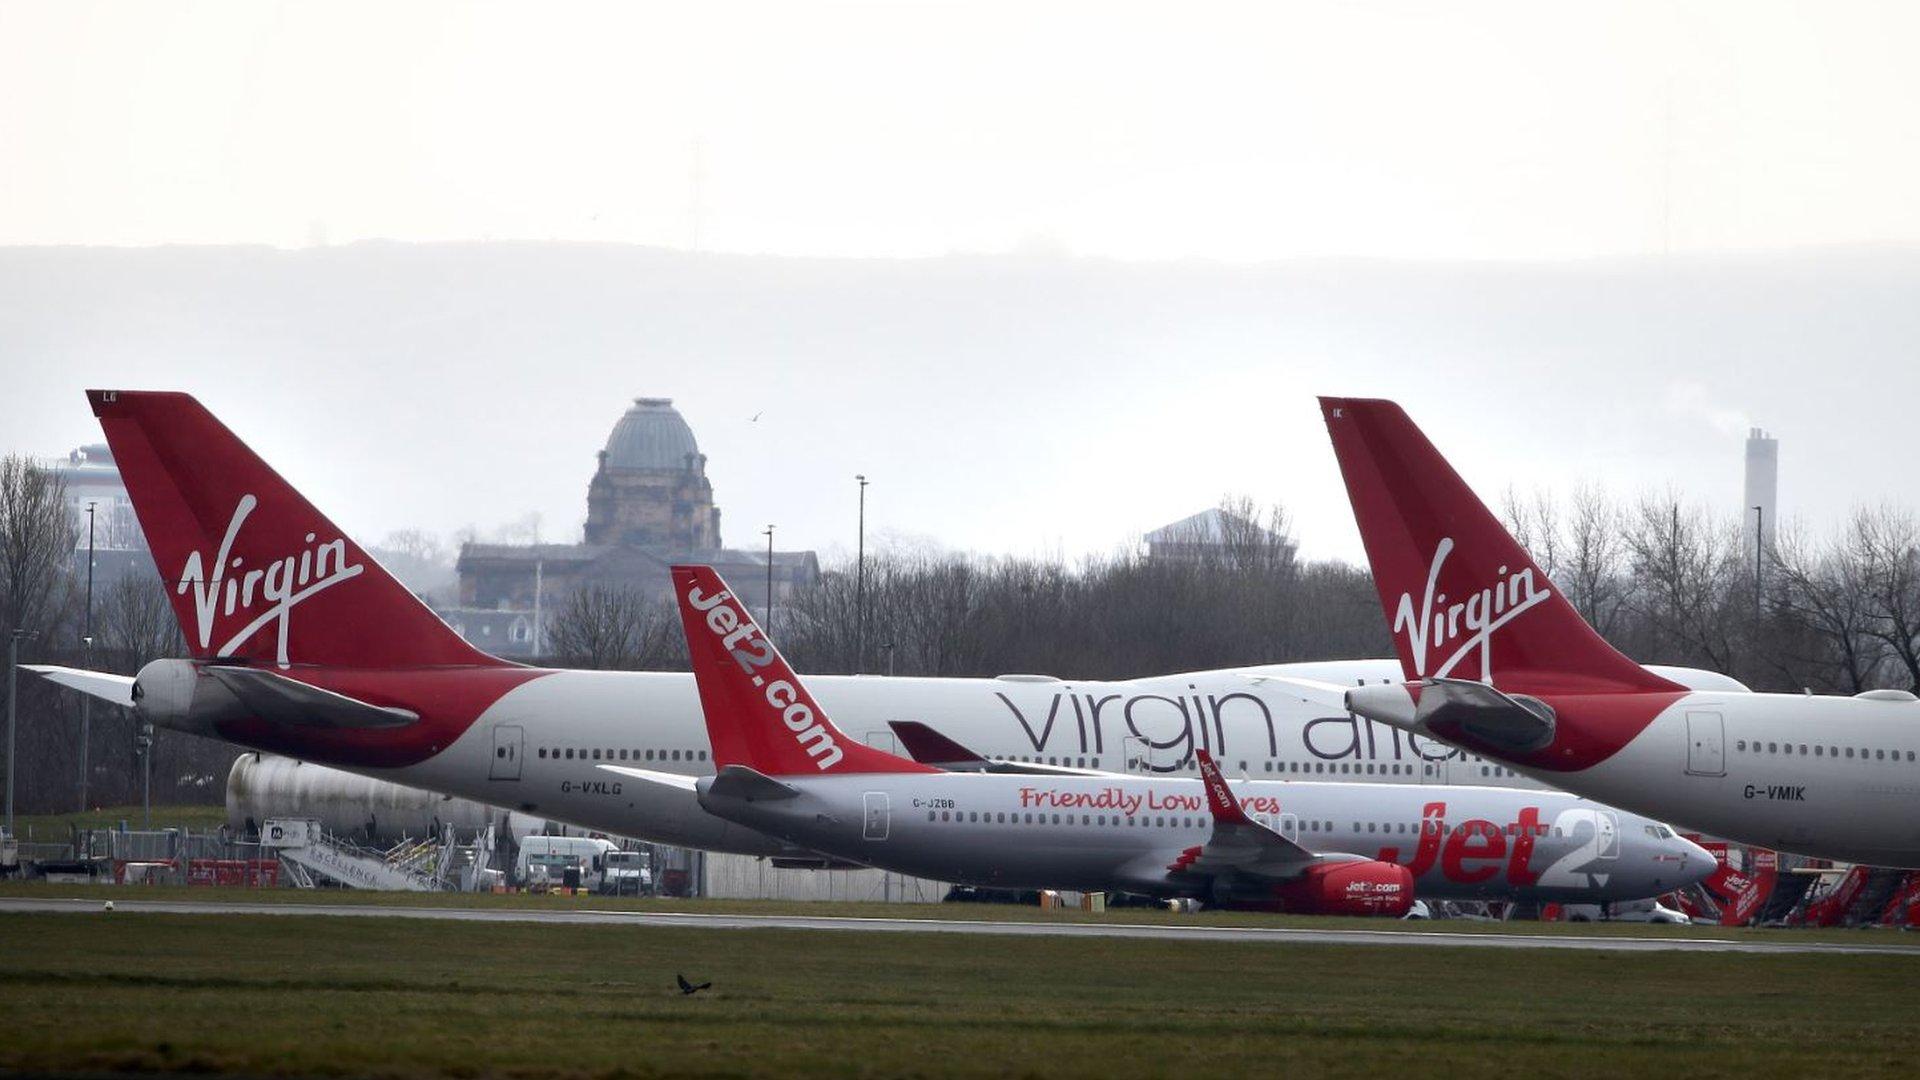 Virgin Atlantic flights at Glasgow Airport